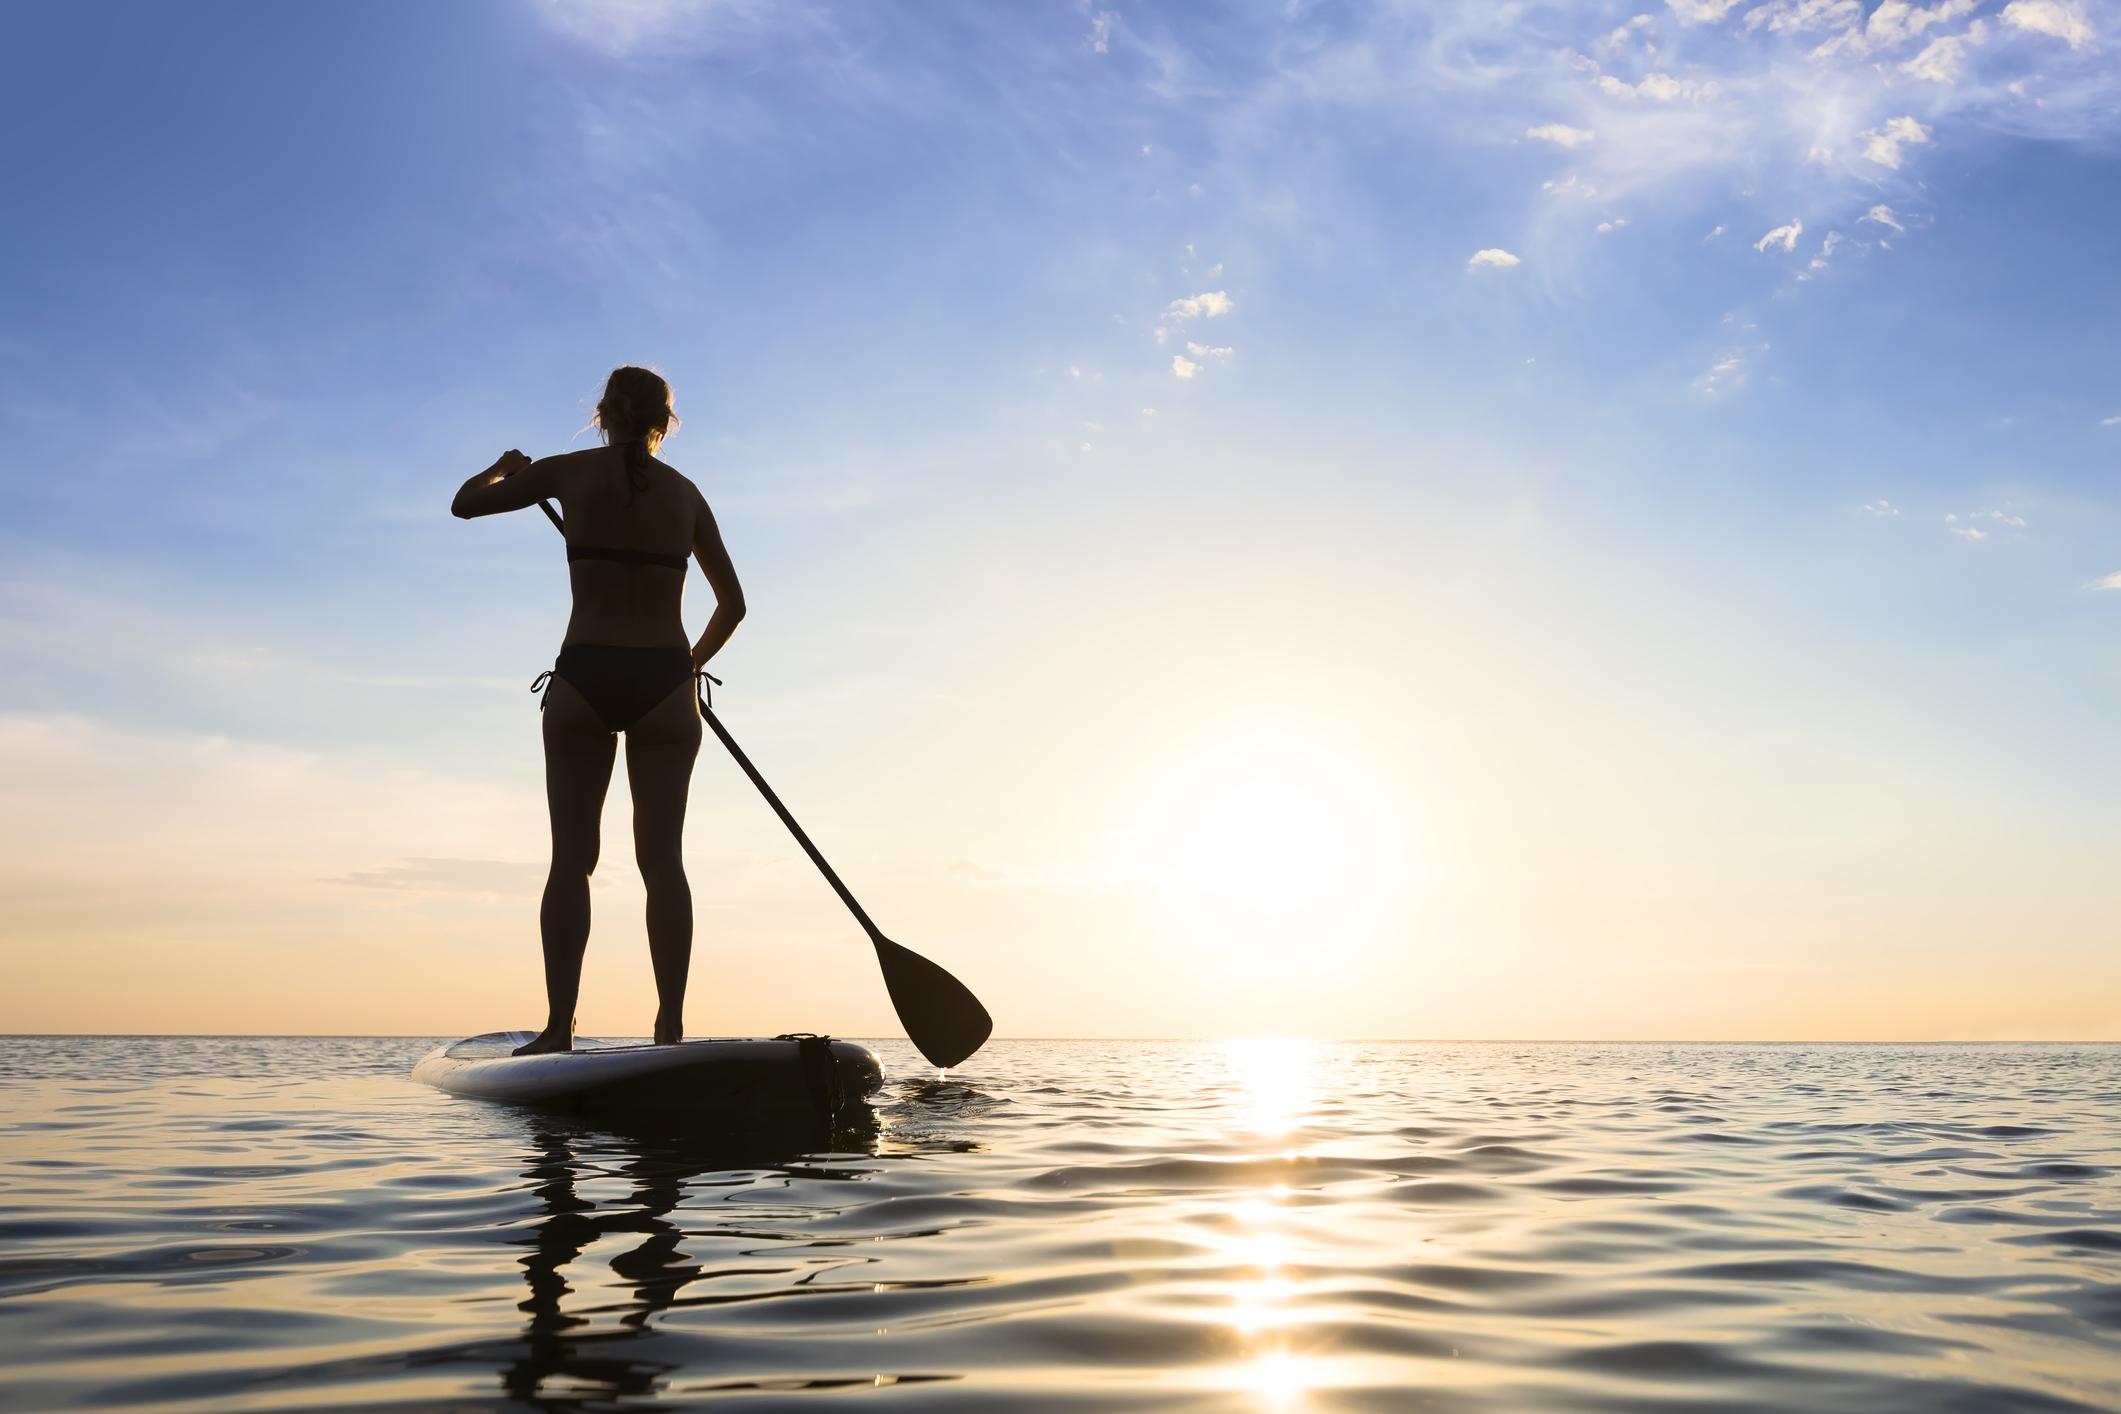 التجديف بالوقوفStand-up Paddle Boarding